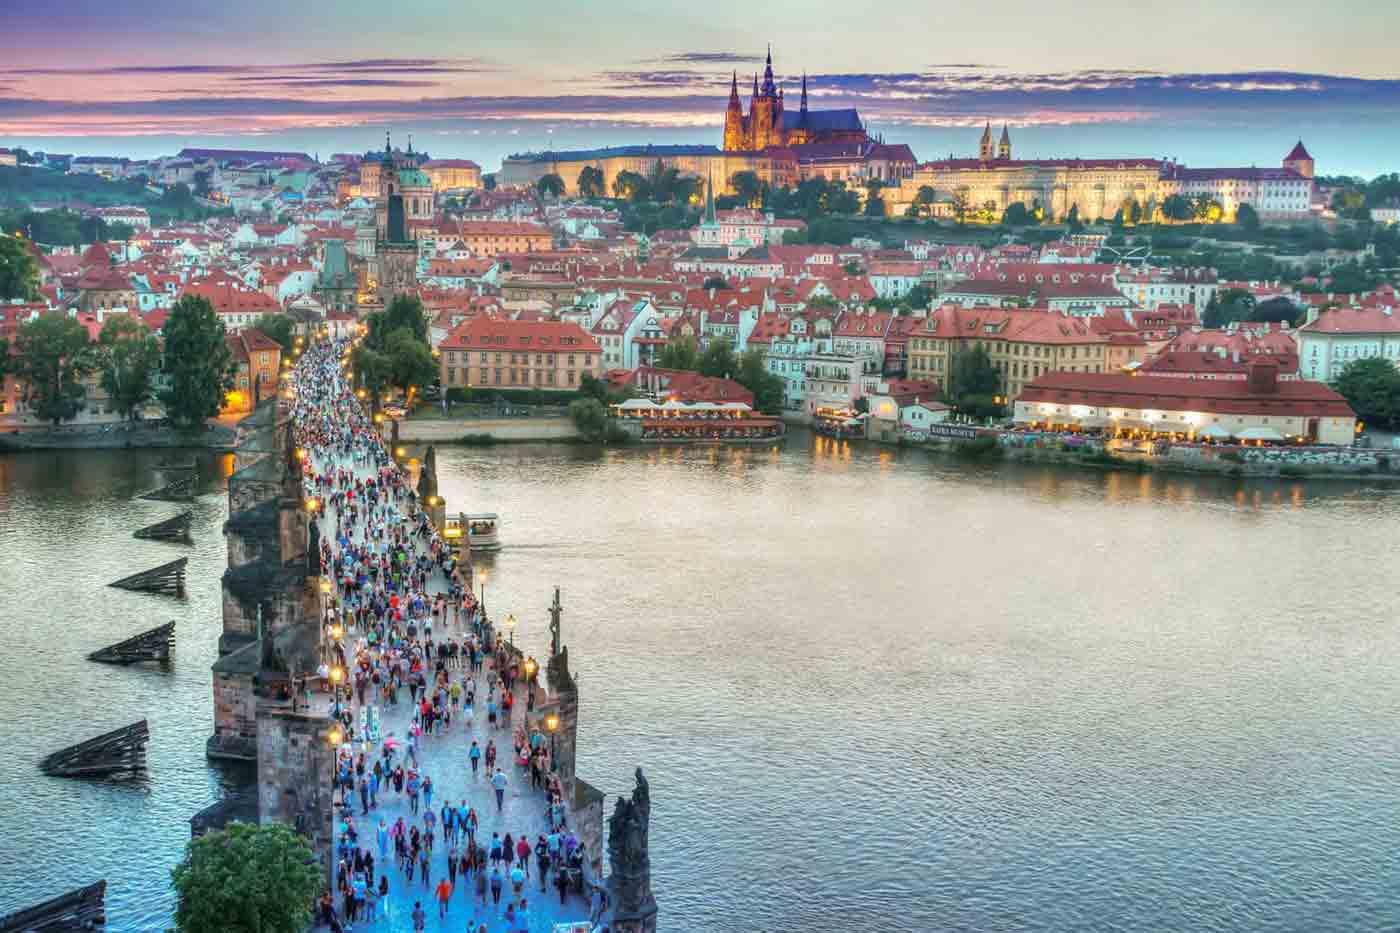 Prague,Salzburg,Vienna, Budapest - Fodors Travel Guide